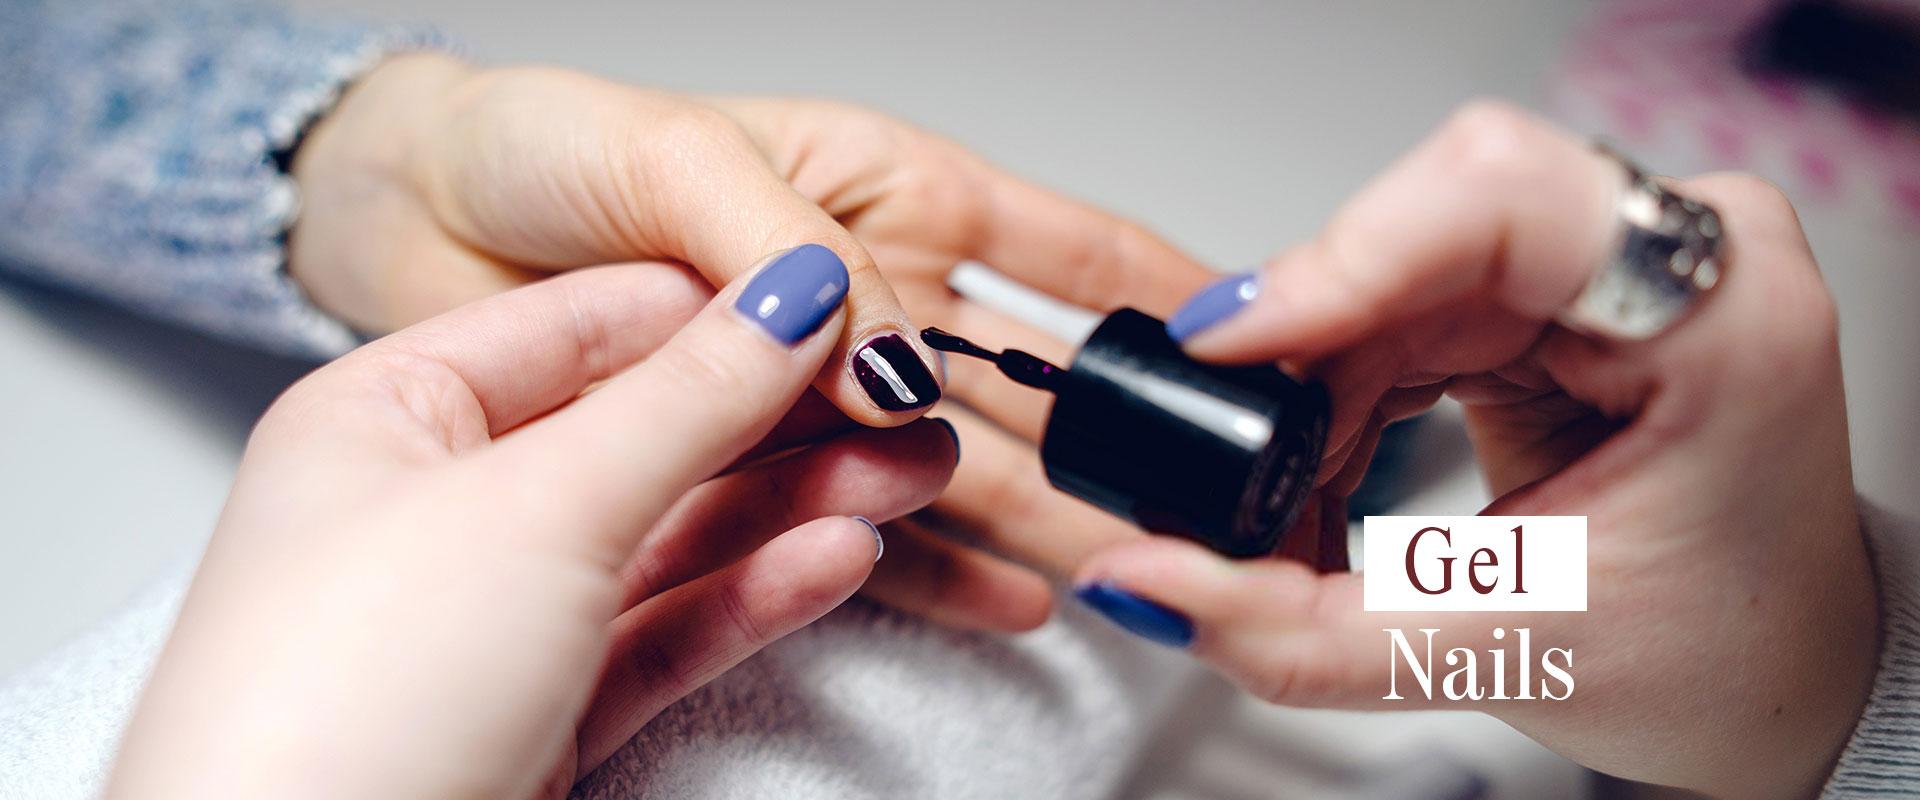 TQ Nails - Nail Salon in Mankato MN 56001